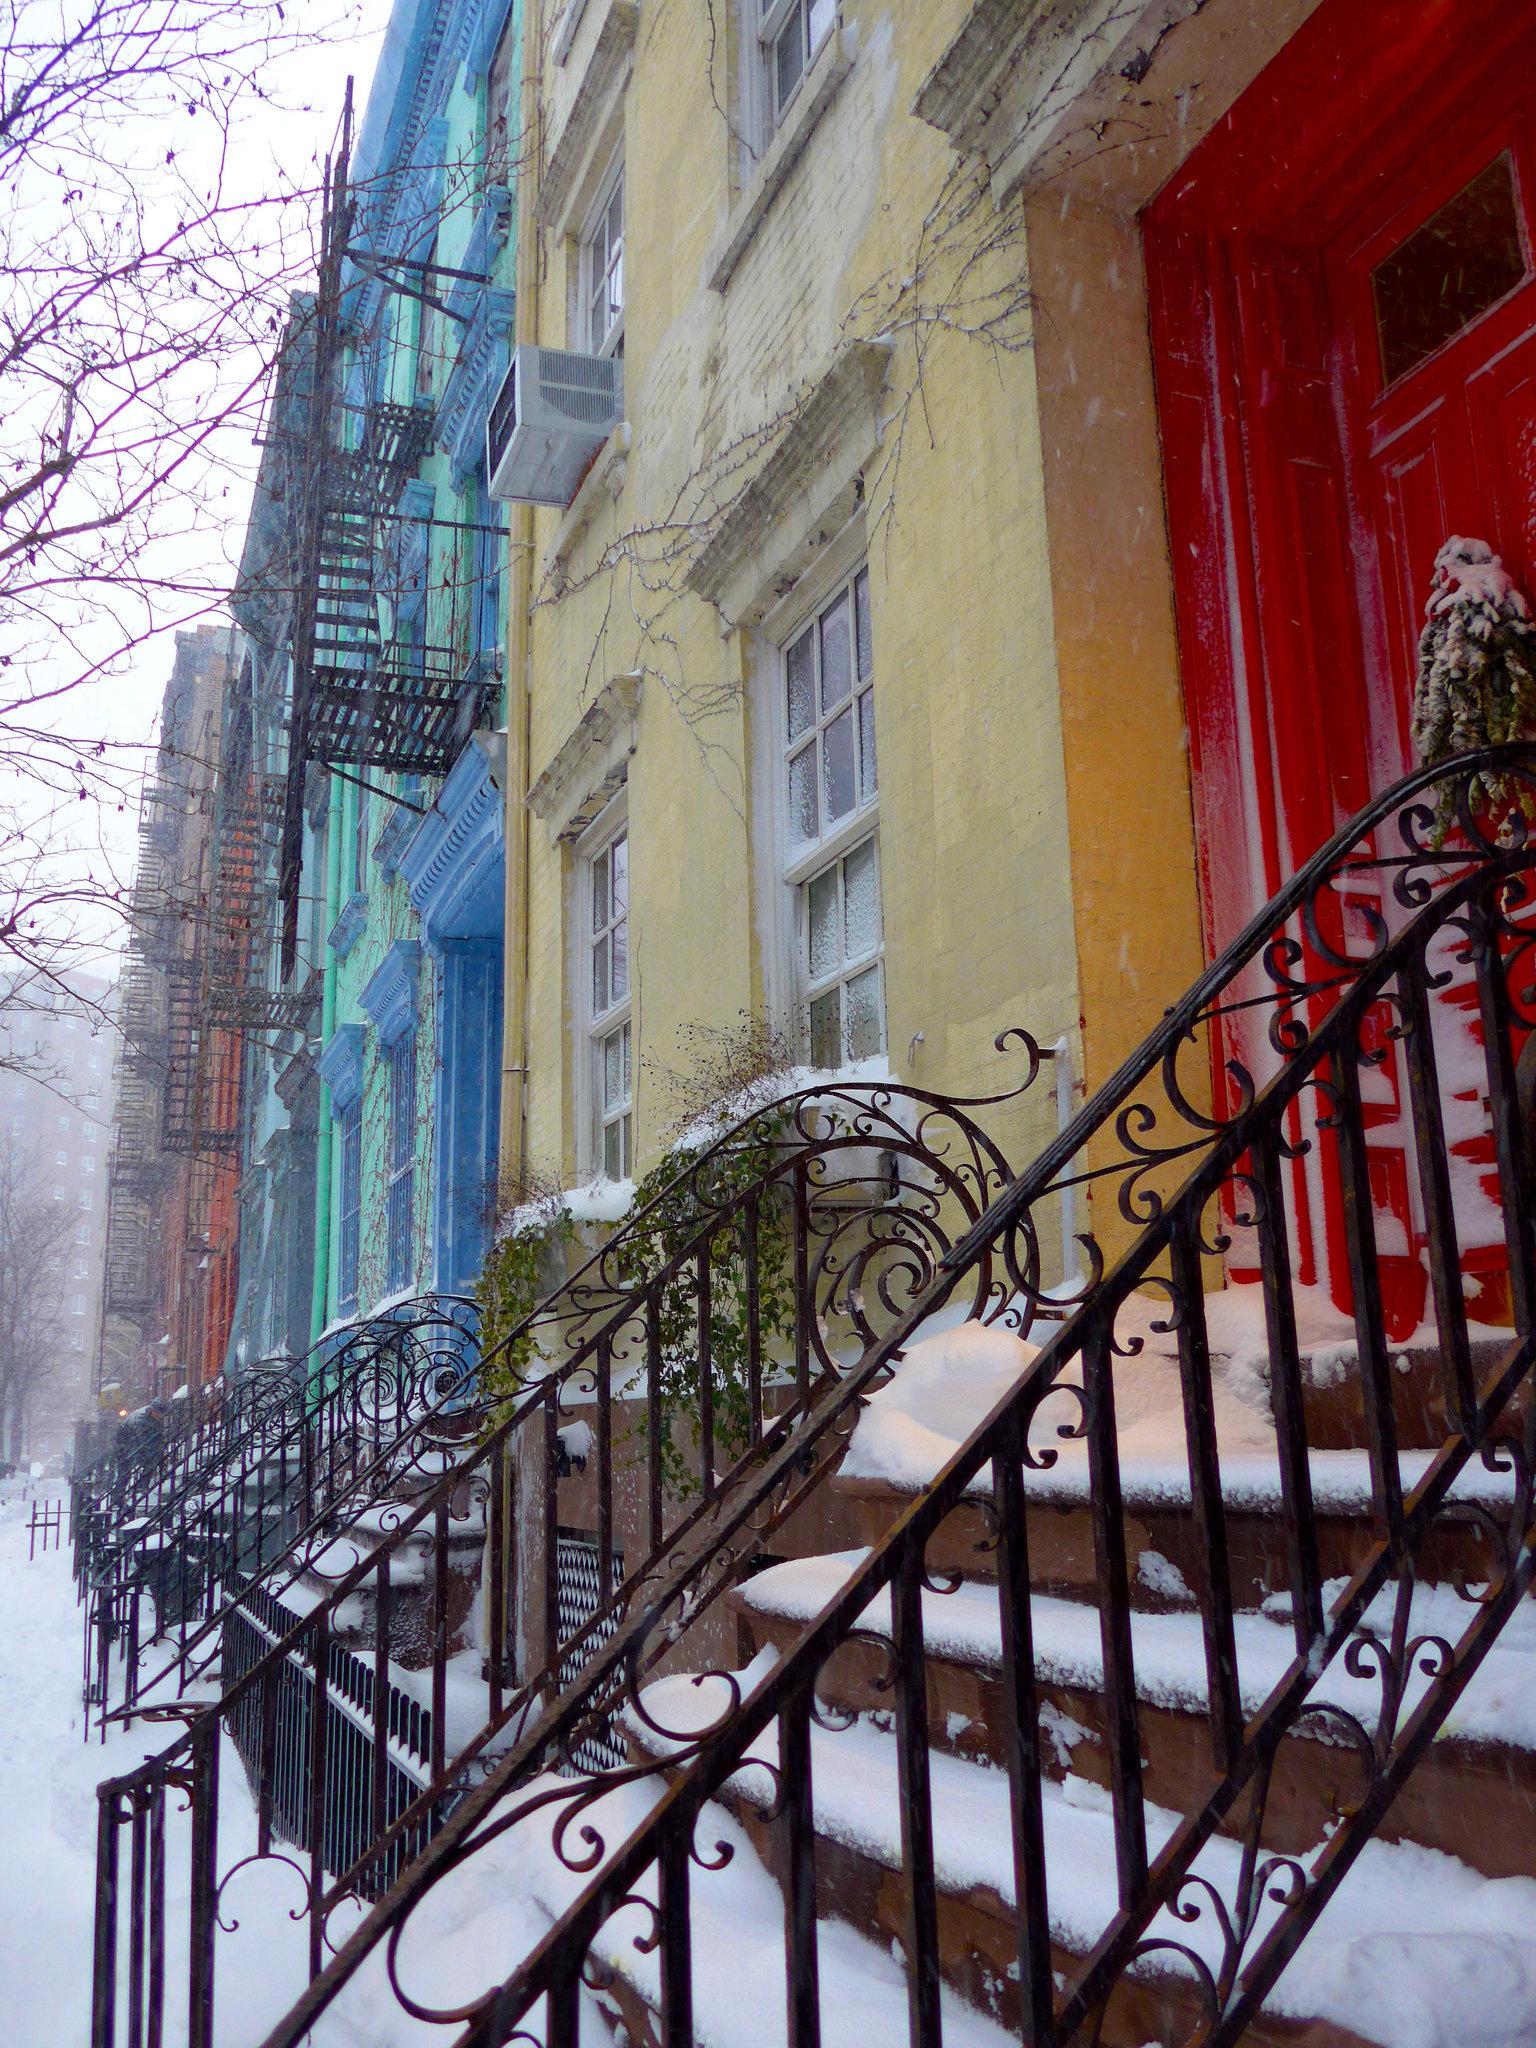 snowy street.jpg